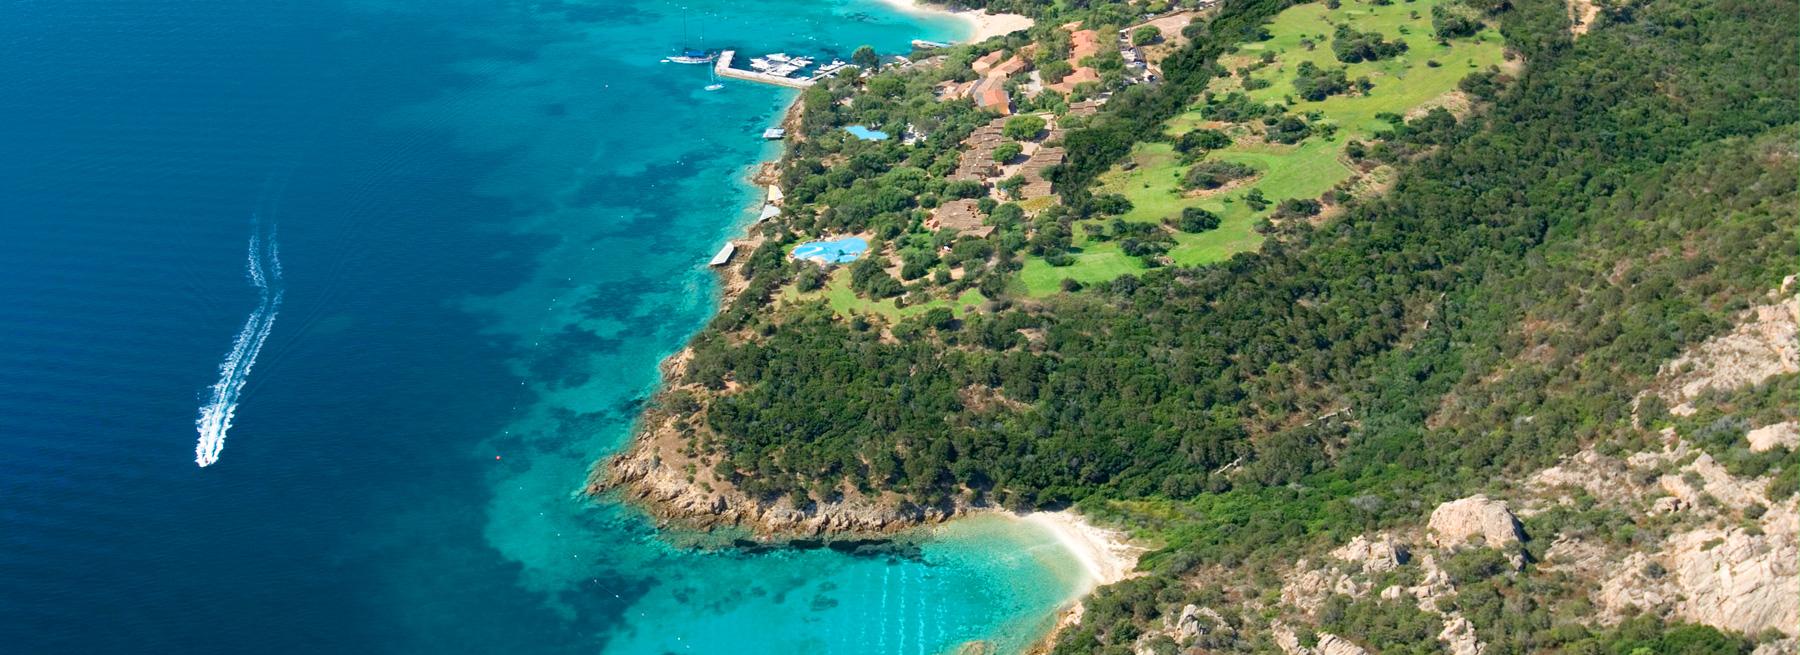 Hotel Capo d'Orso Palau Sardinien